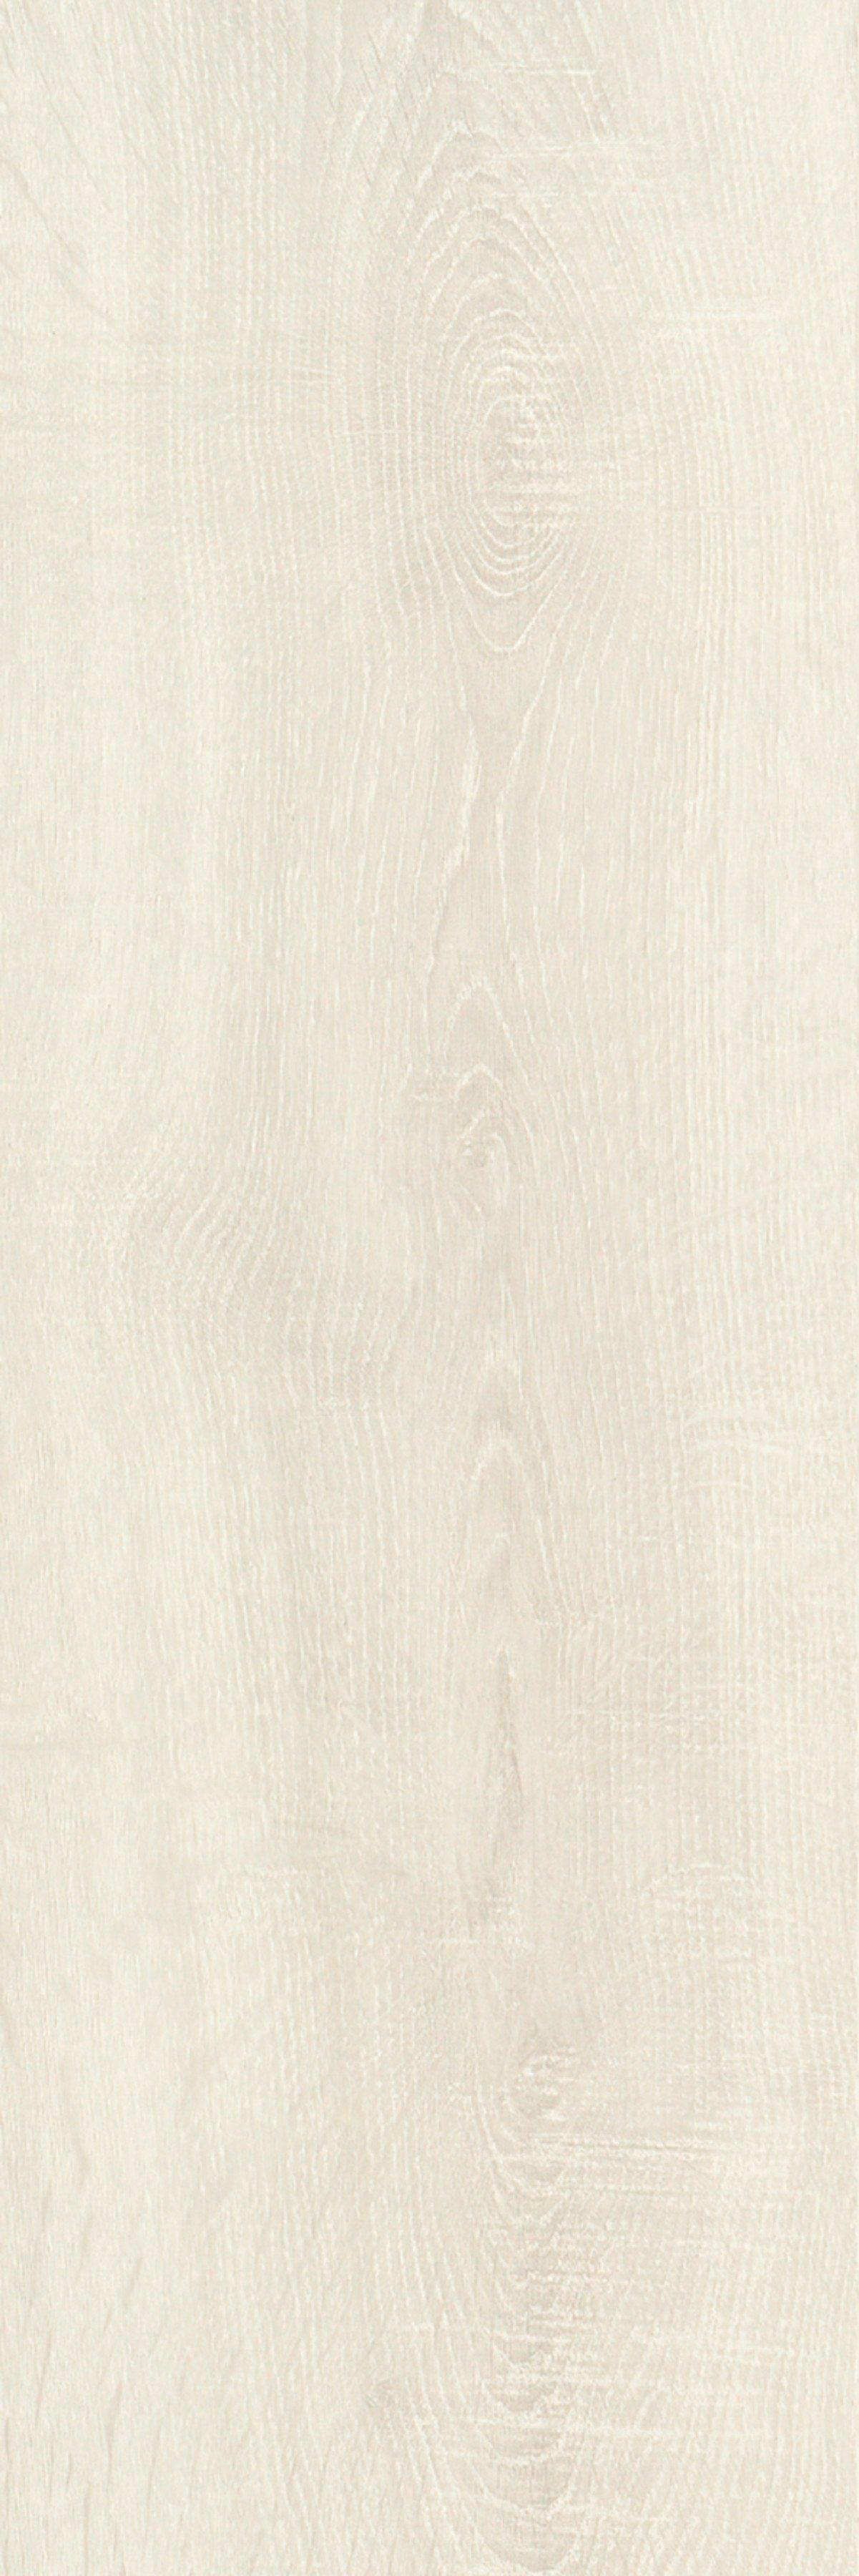 MODERNA Laminat »Lifestyle - Arctic Eiche«, 1287 x 190 mm, Stärke 8 mm | Baumarkt | Mdf | MODERNA